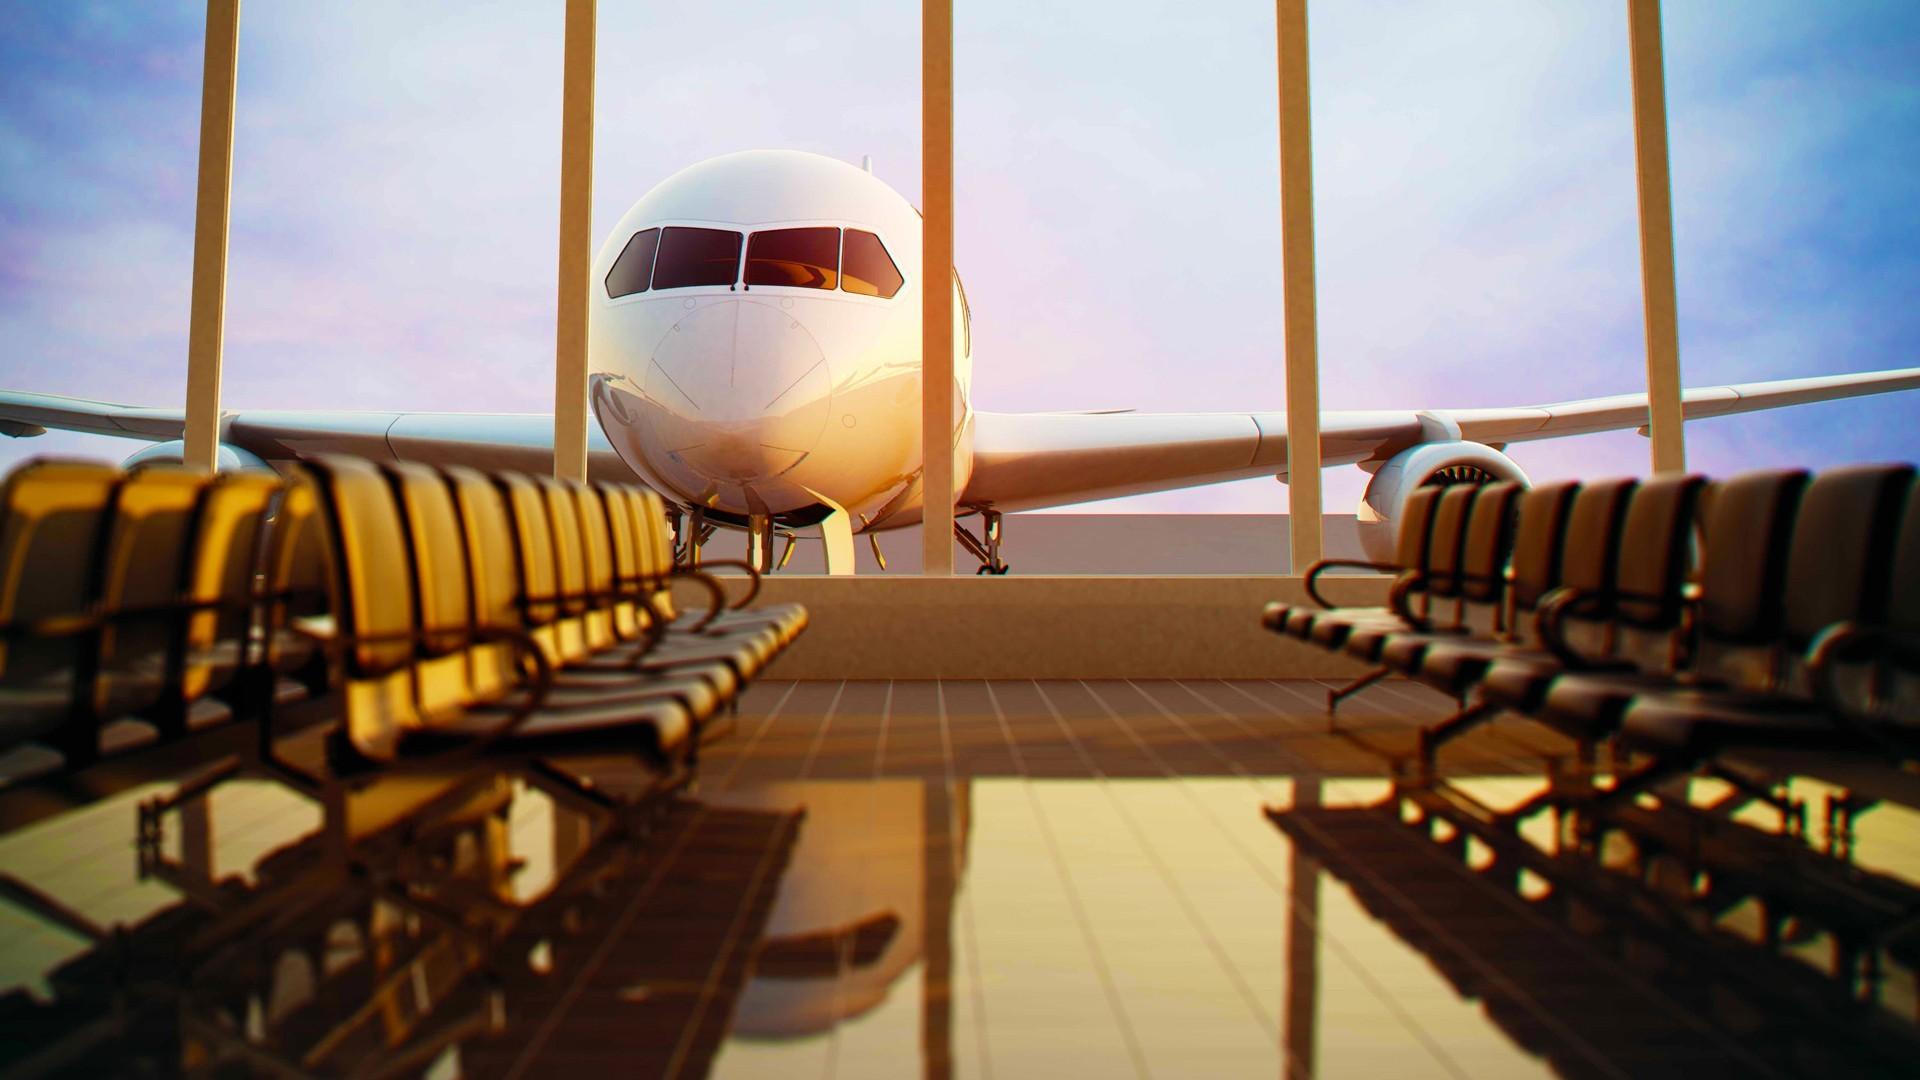 General 1920x1080 airplane airport chair passenger aircraft window sunlight reflection depth of field waiting glass